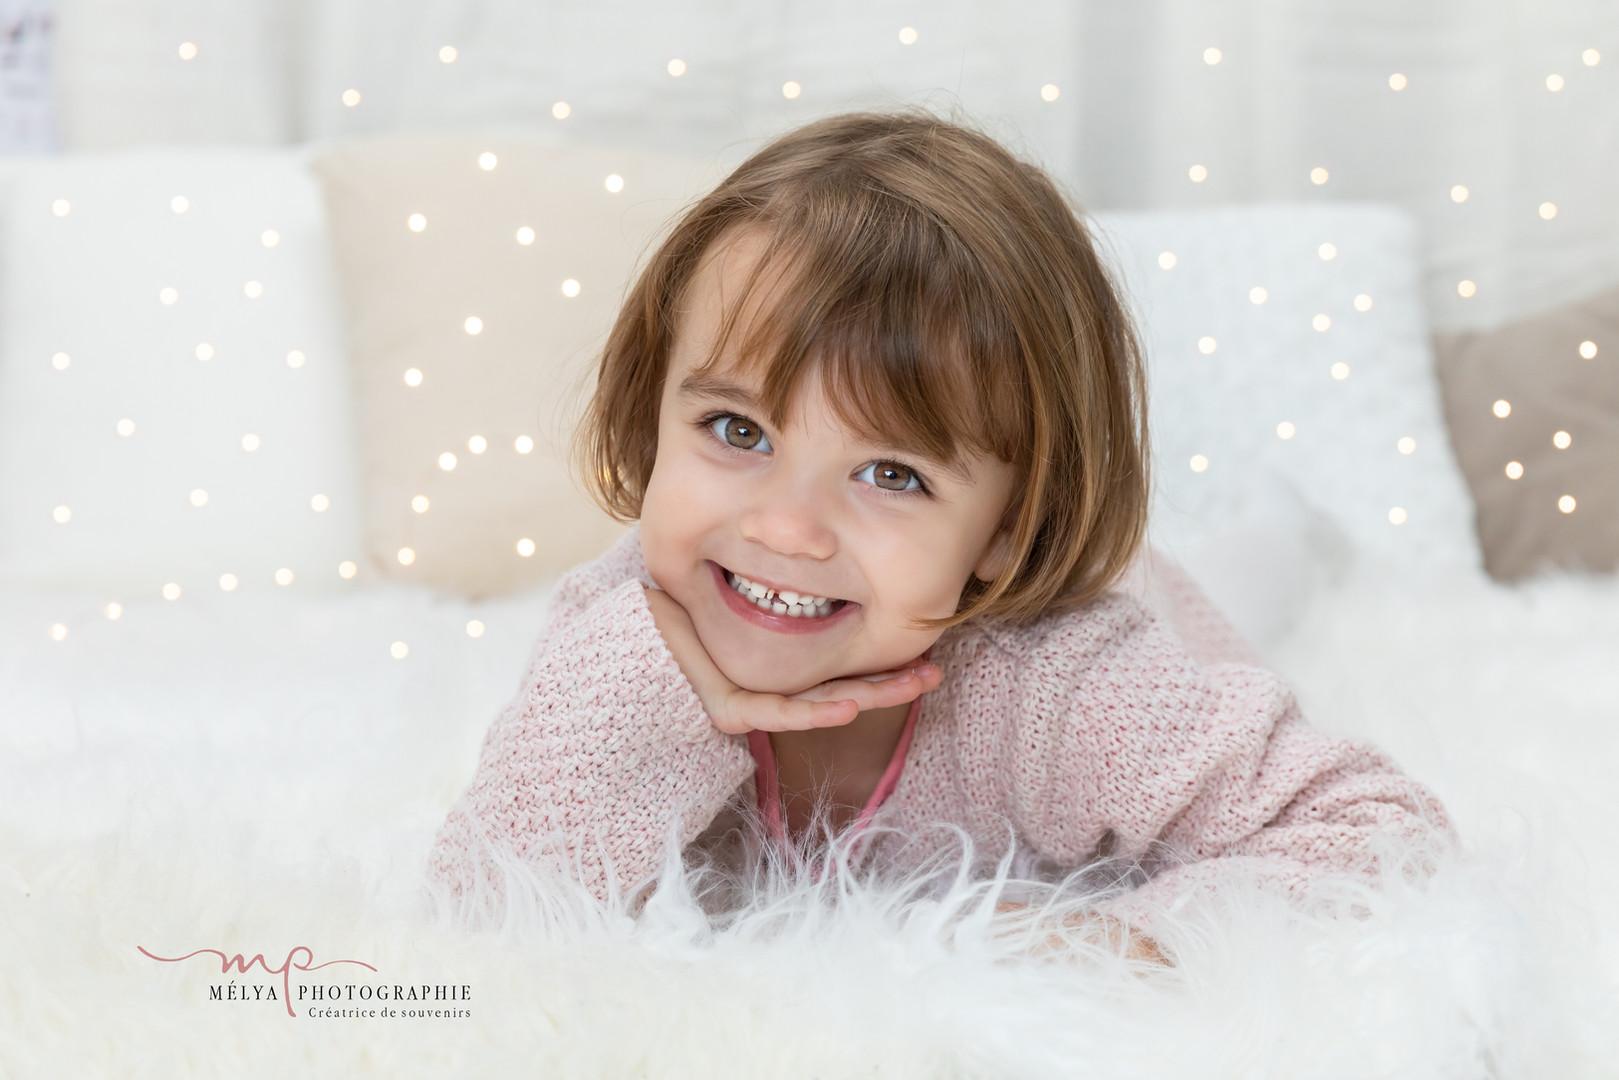 séance photo enfant mélya photographie